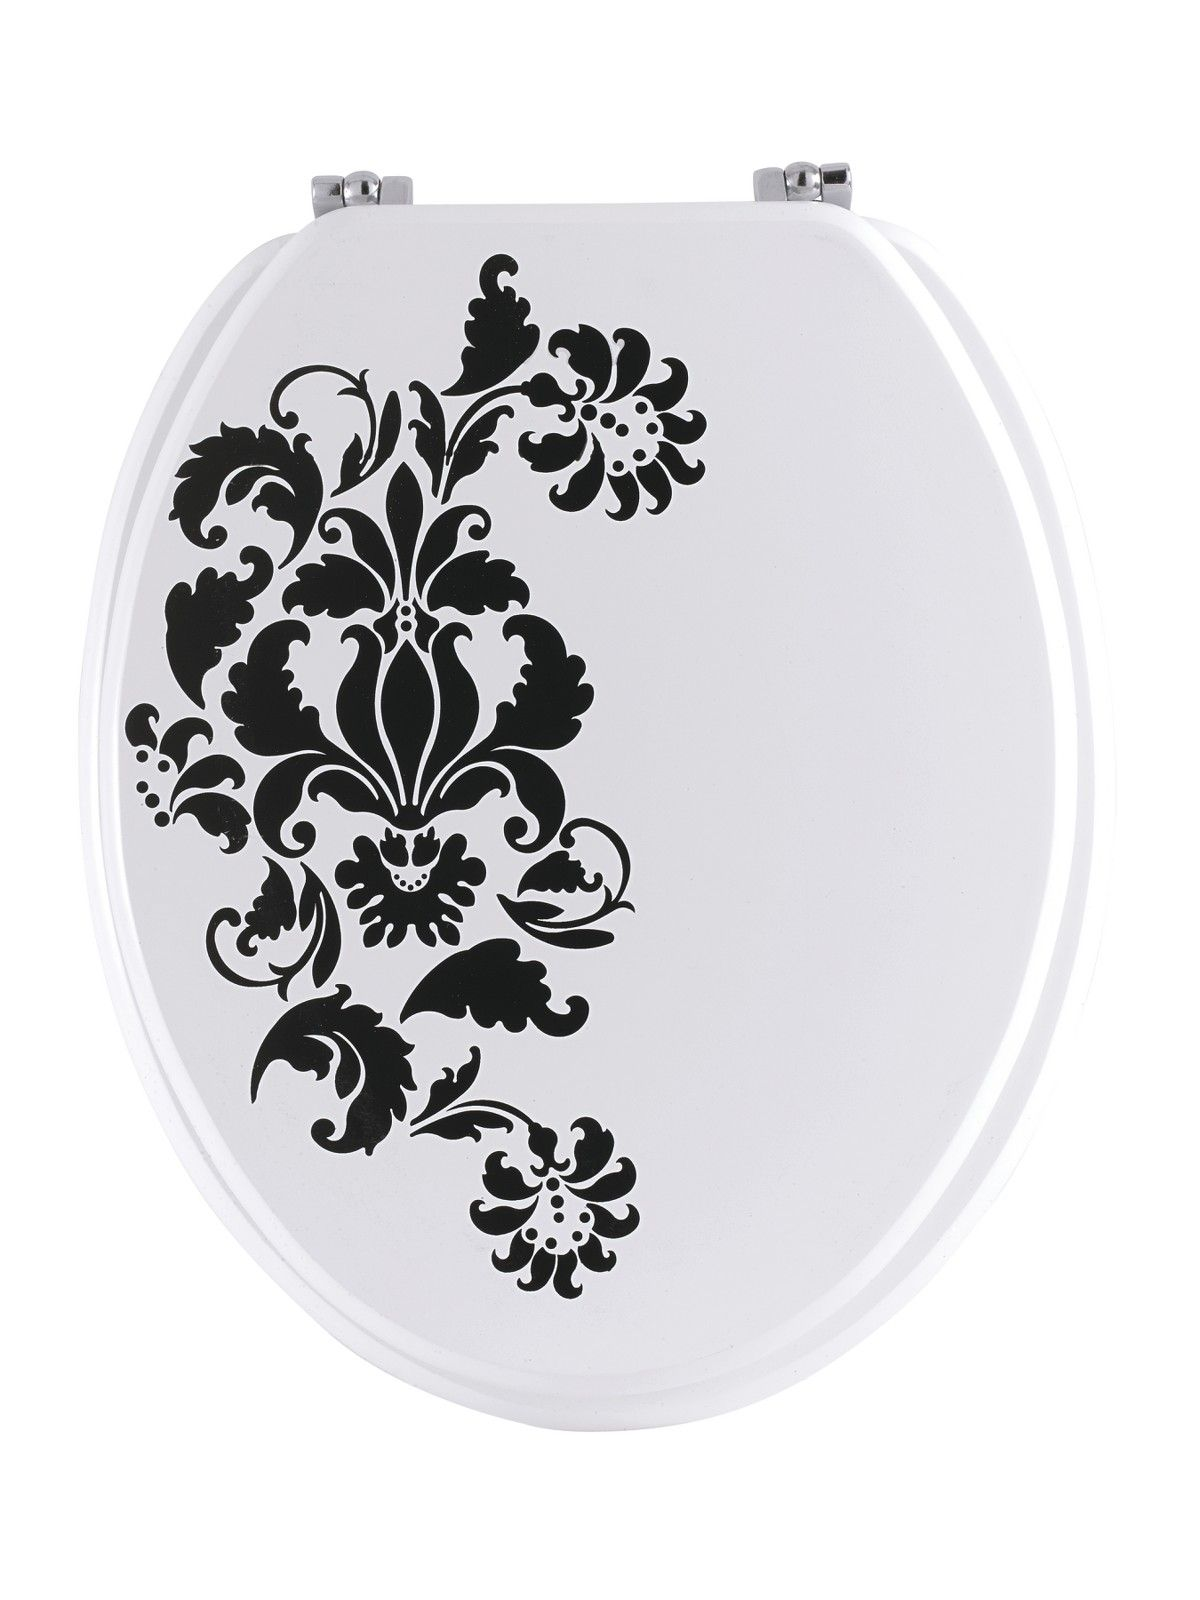 Swell Isme Becomes Home Ideas Toilet Tableware Verona Uwap Interior Chair Design Uwaporg